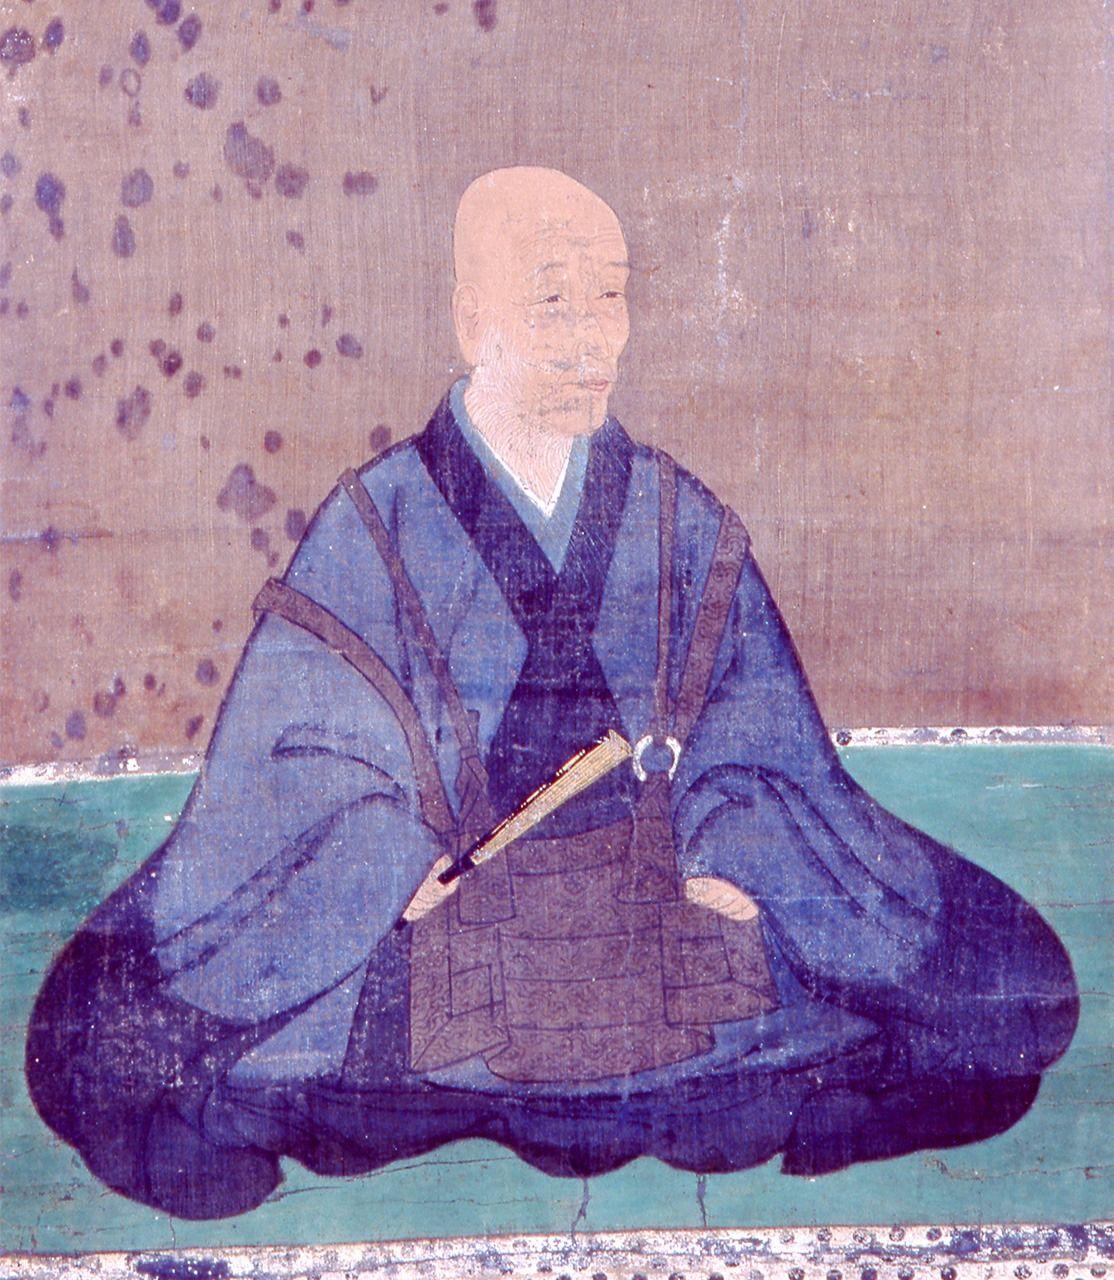 Портрет монаха Соги (Исторический музей Ямагути преф. Ямагути)